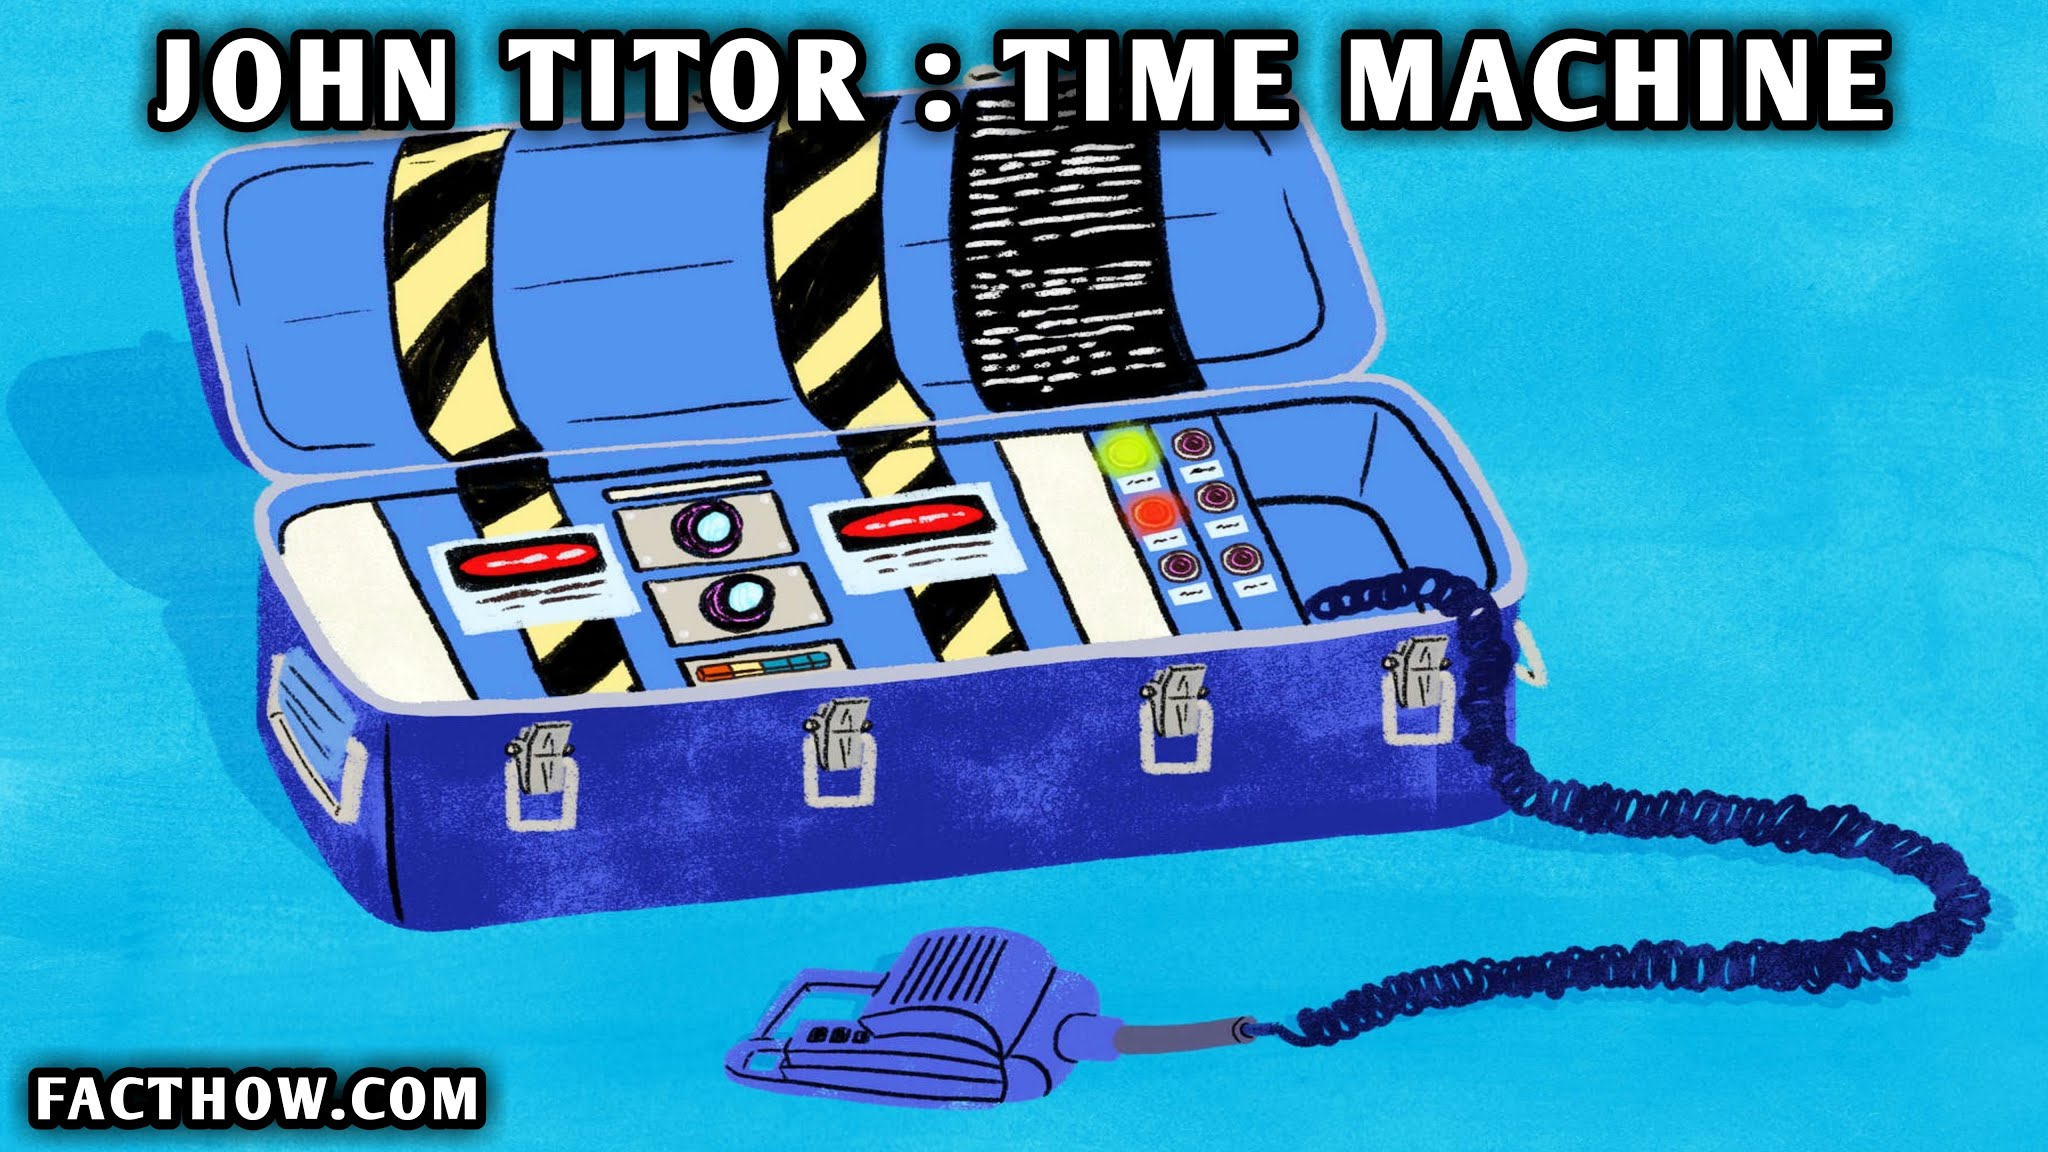 Time-travel-real-story-samay-yatra-time-machine-amazing-facts-interesting-facts-rochak-tathya-fact-how-facthow-hindi-time-traveller-real-story-samay-yatra-ki-sacchi-kahaani